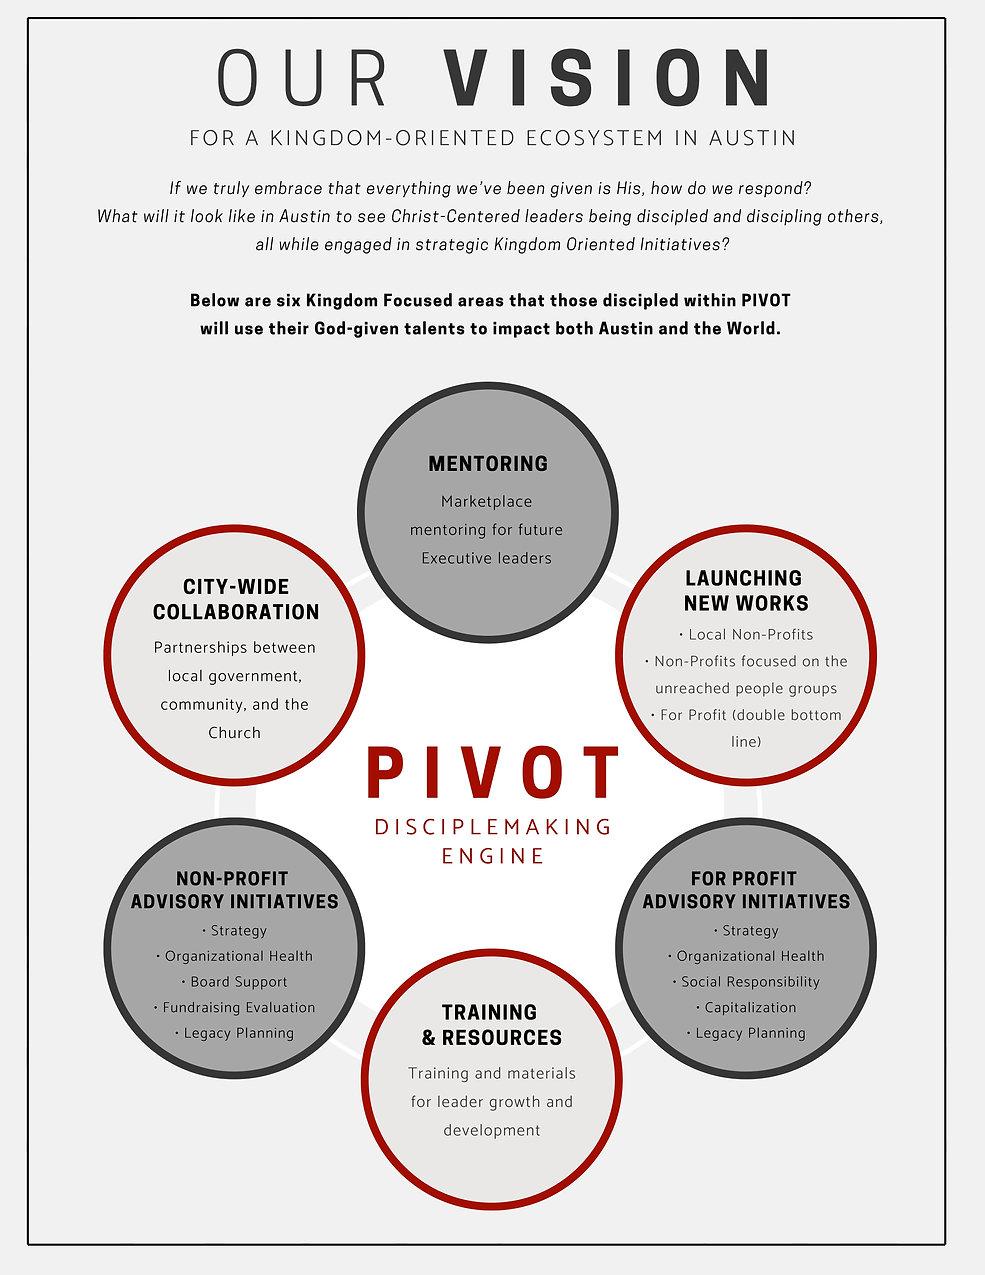 PIVOT Disciplemaking Engine.jpg